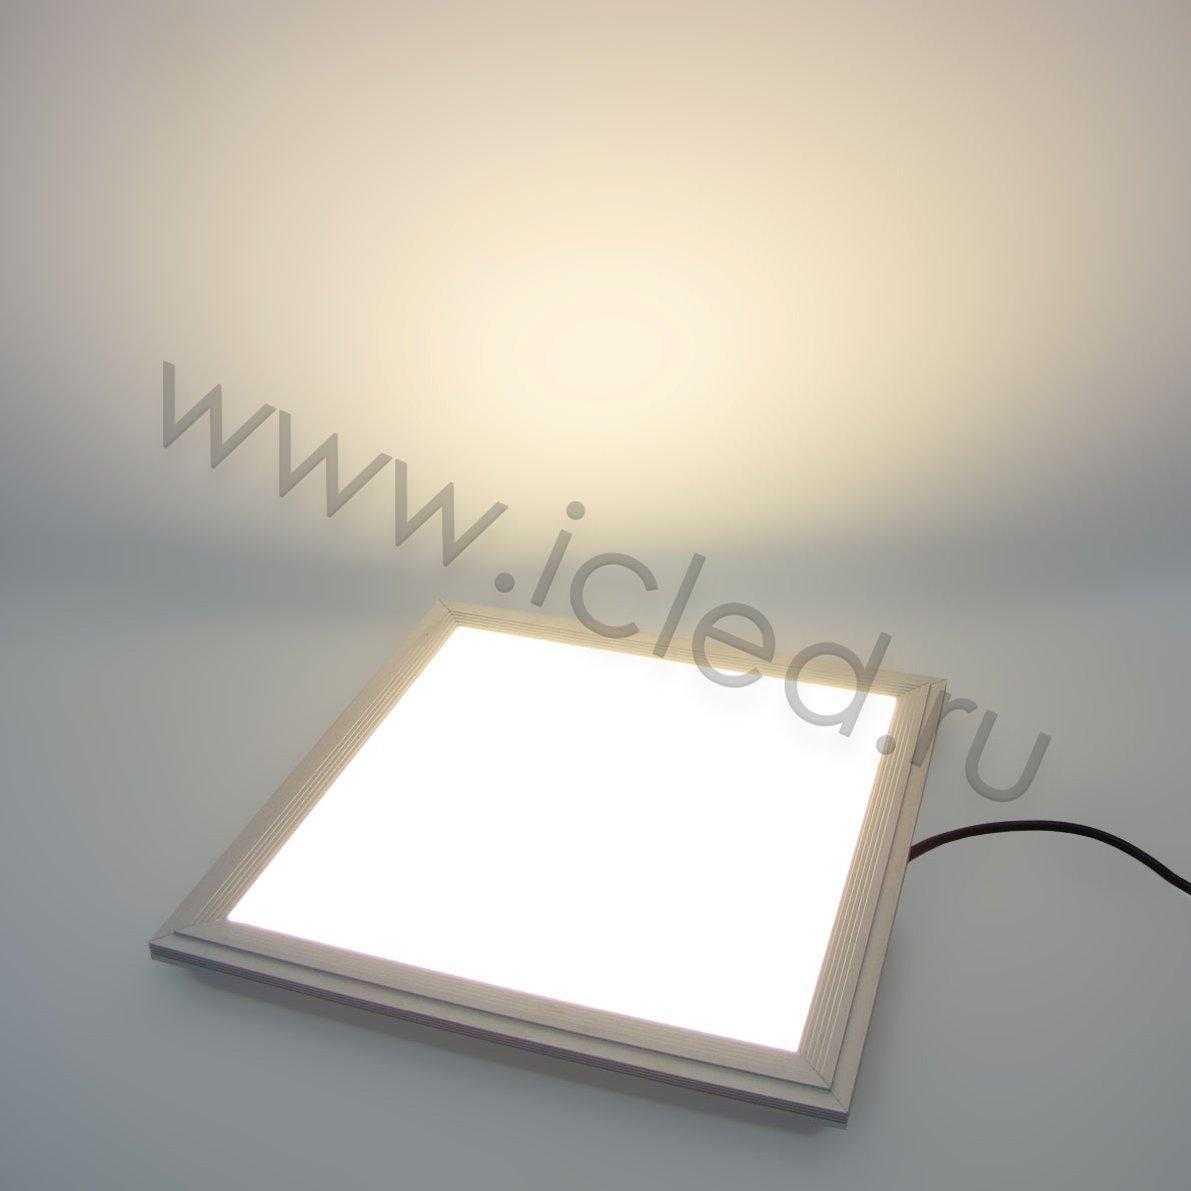 Светодиодная панель S L300 LIGHT-CUBE (18W, 220V, Warm White)